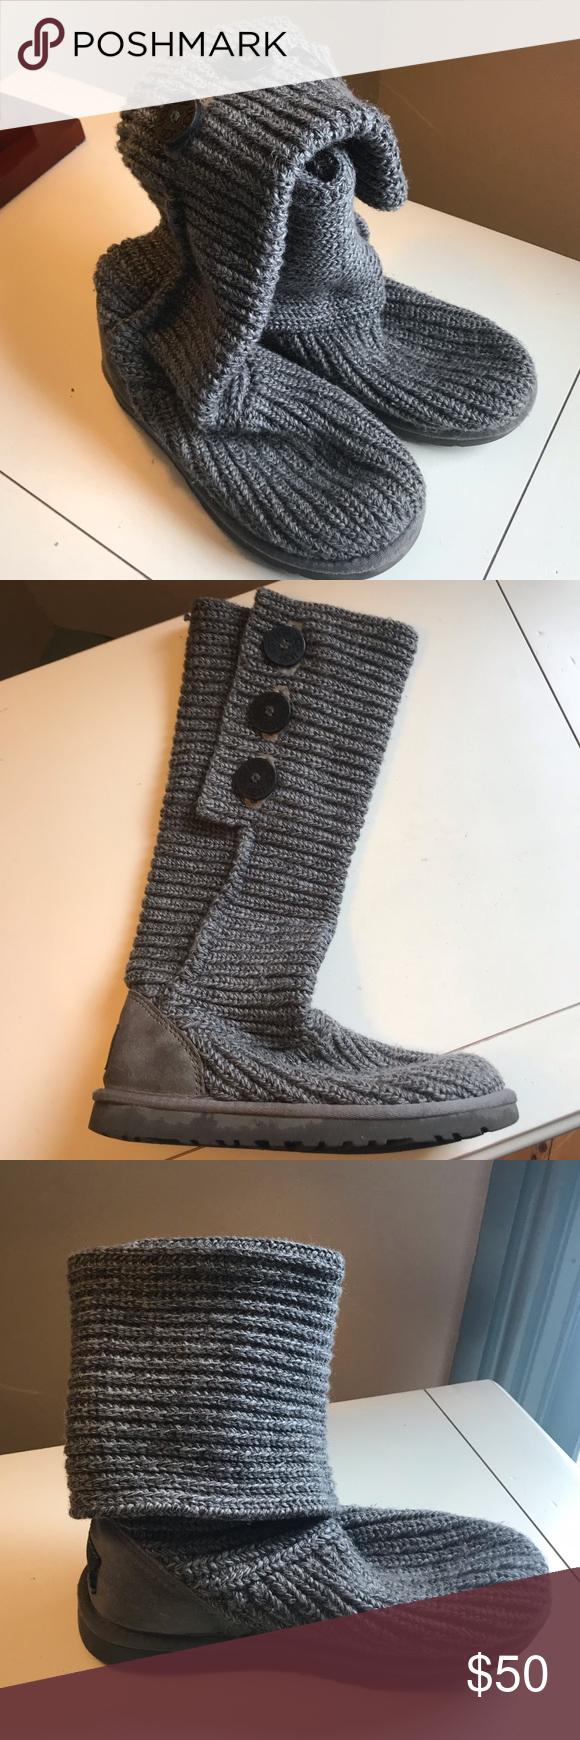 Ugg Sweater Boots In 2018 My Posh Picks Pinterest Sweater